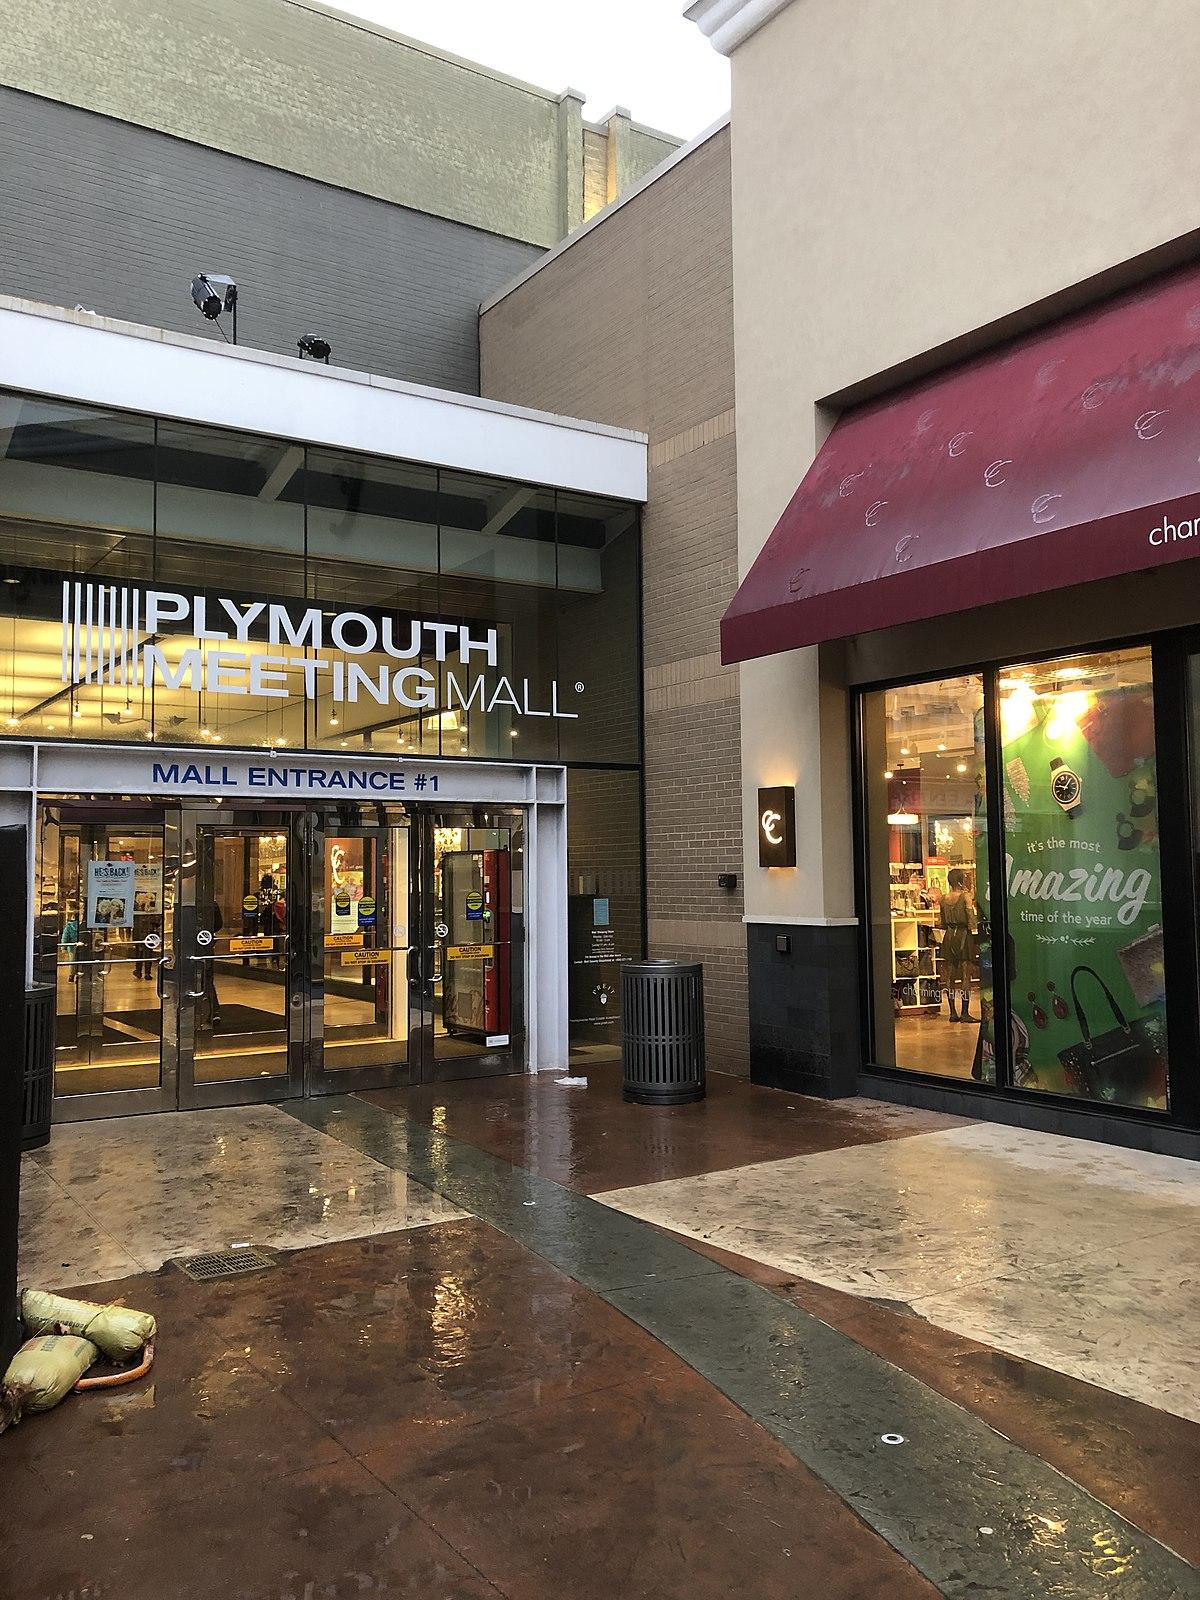 Awe Inspiring Plymouth Meeting Mall Wikipedia Download Free Architecture Designs Rallybritishbridgeorg